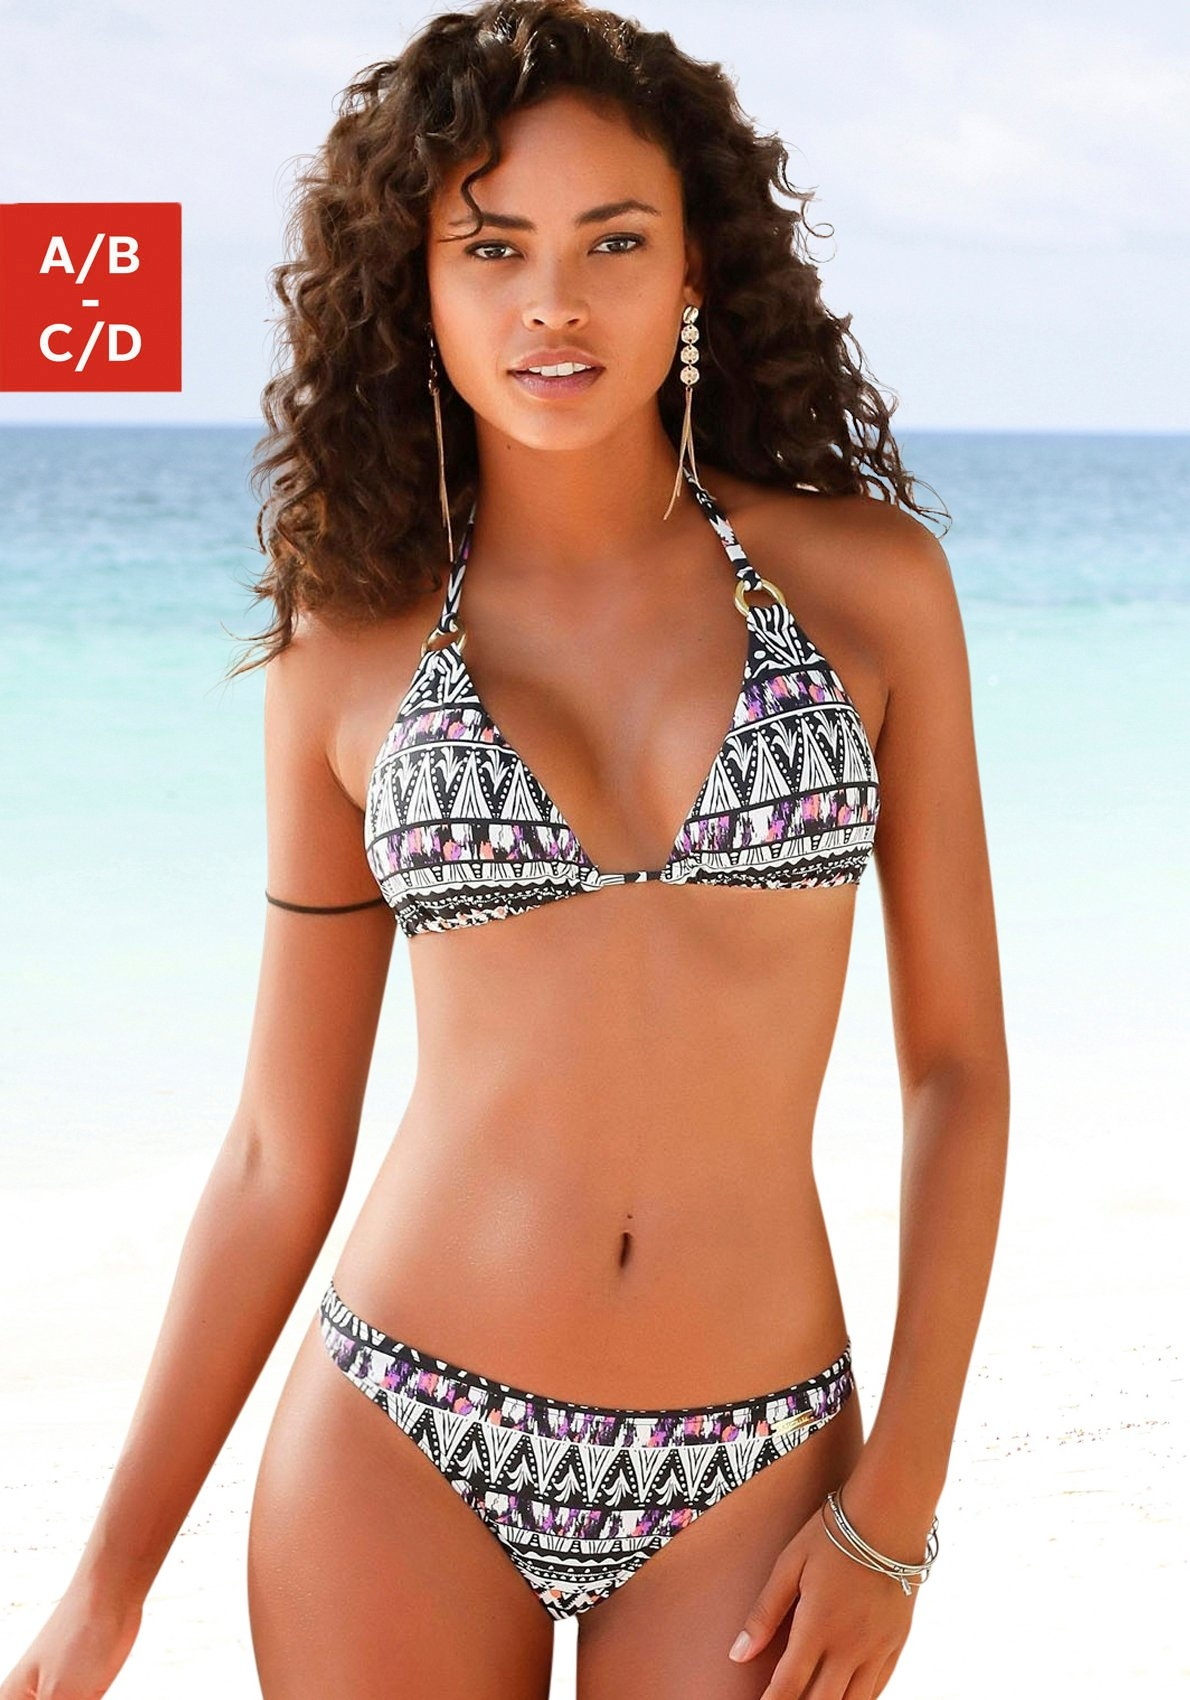 Lascana Triangel-bikinitop Belize met goudkleurige sierringen - gratis ruilen op lascana.nl